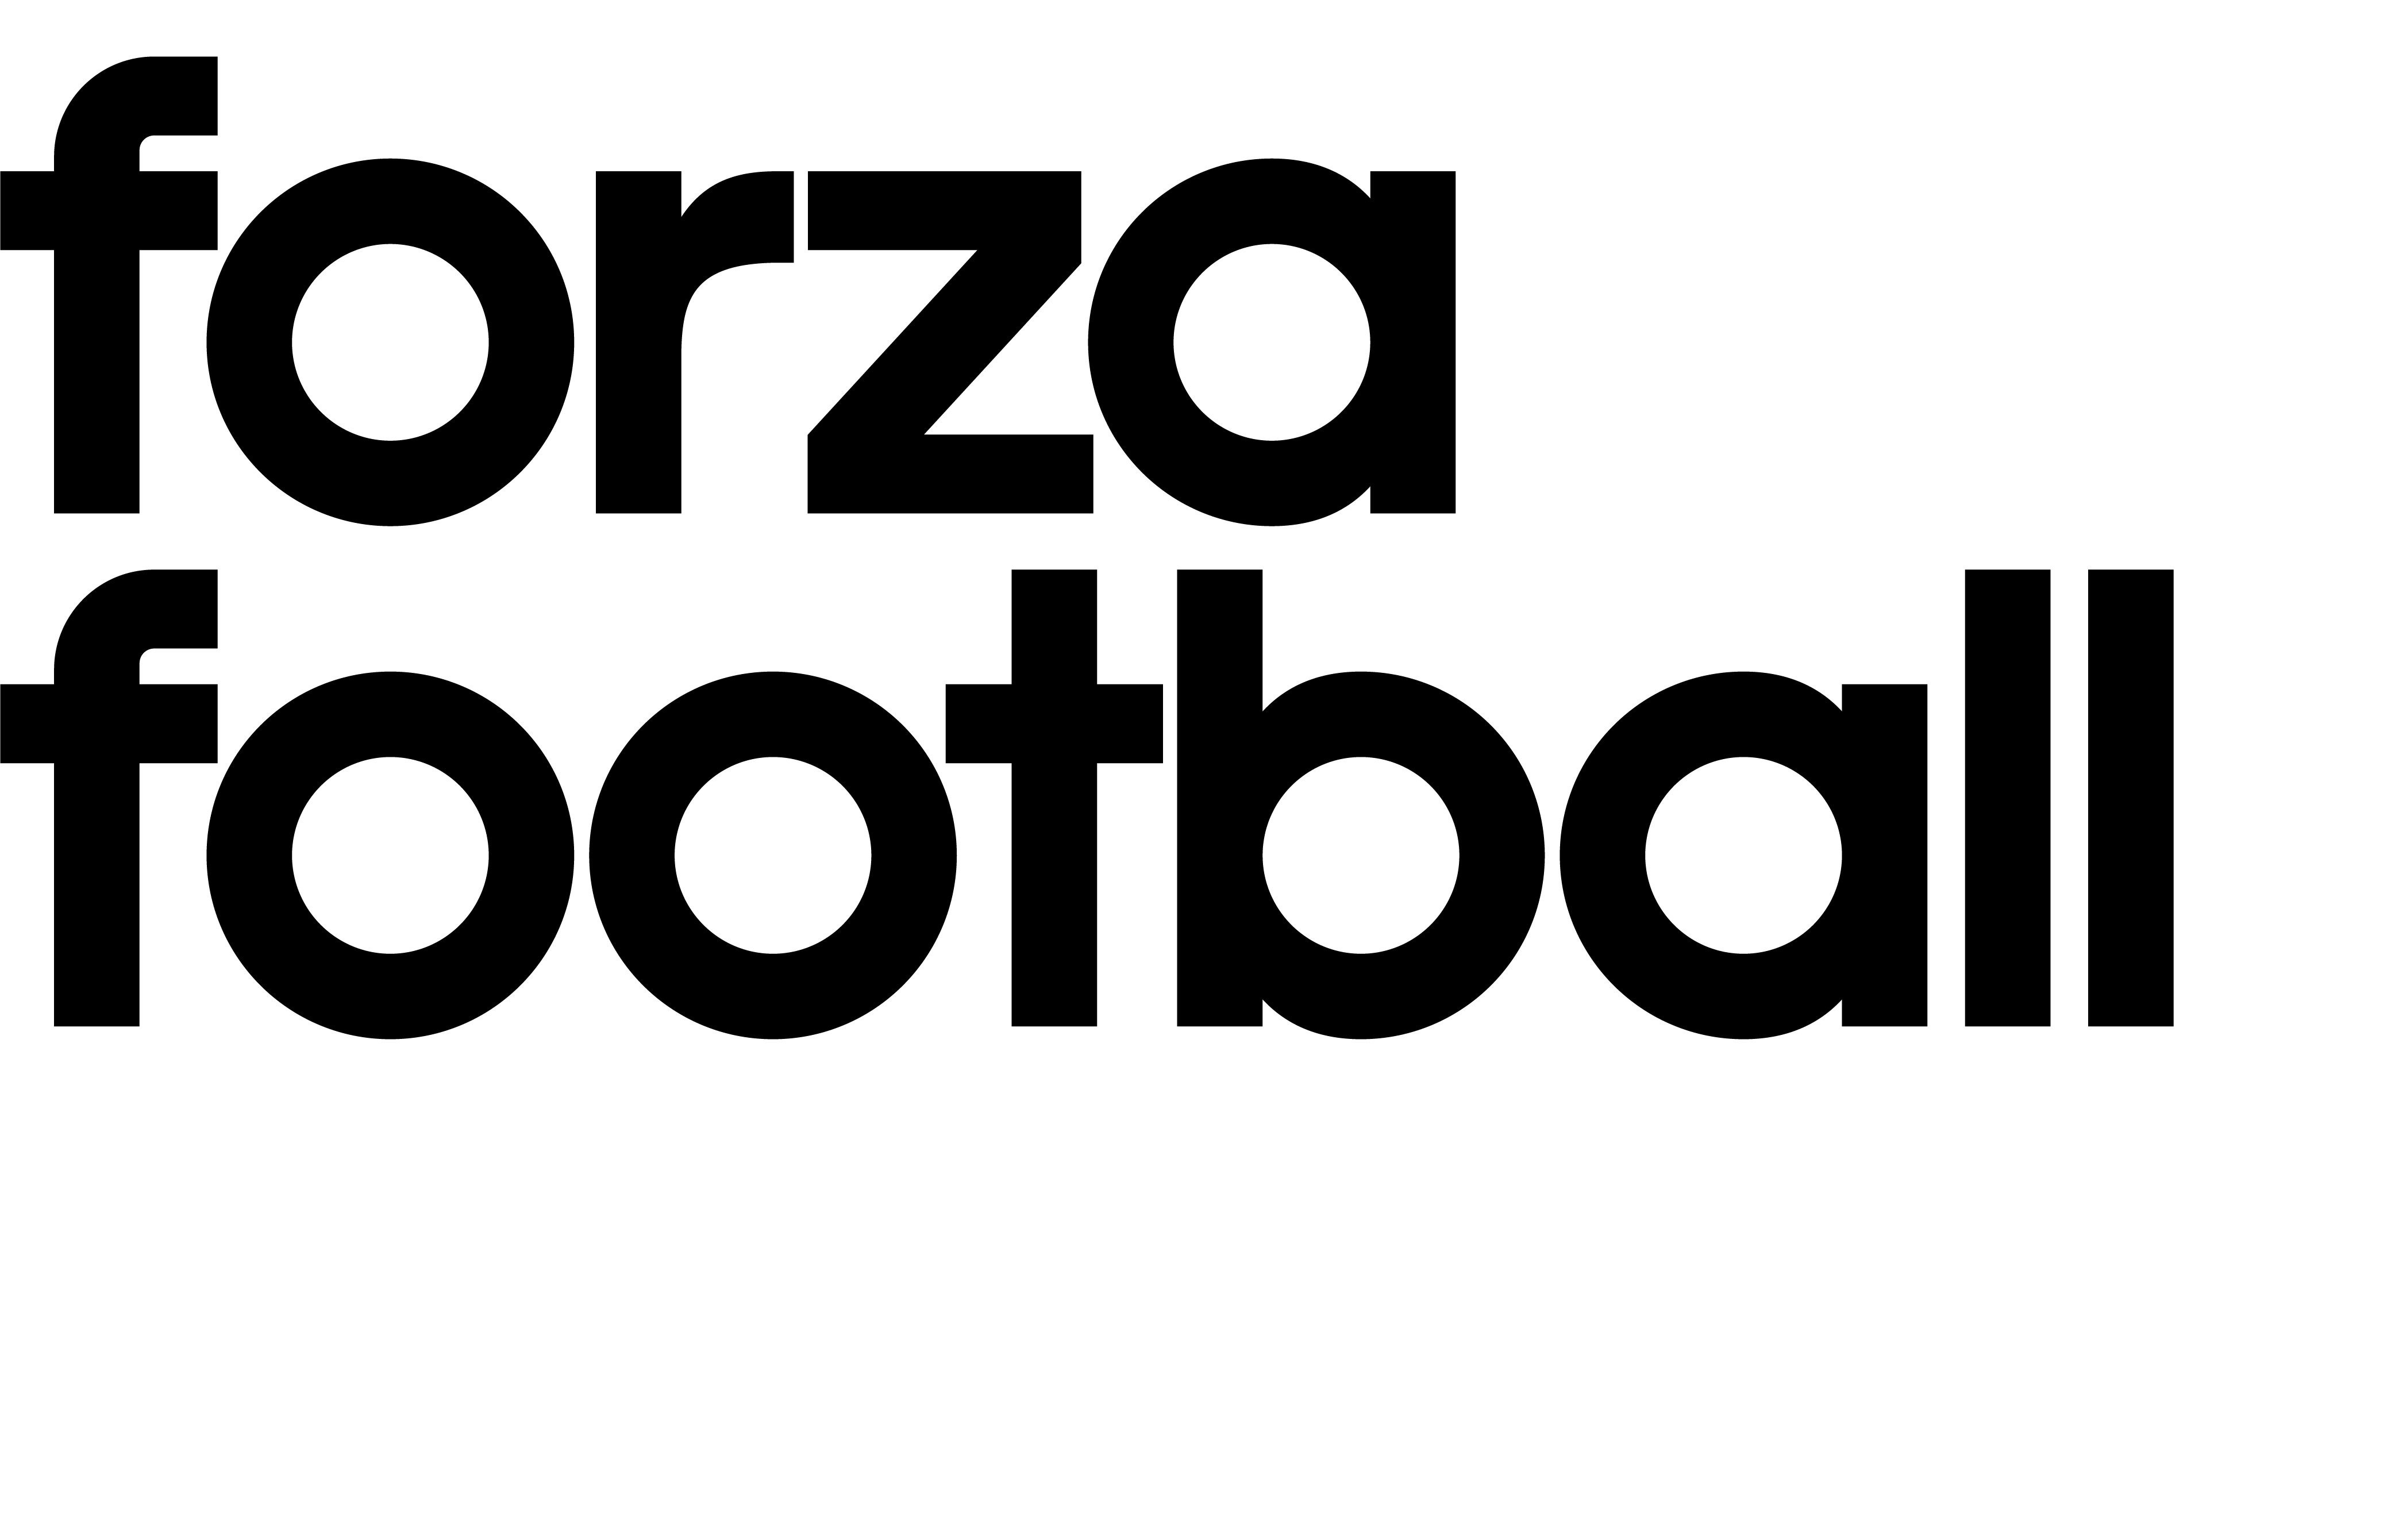 logo-text-1